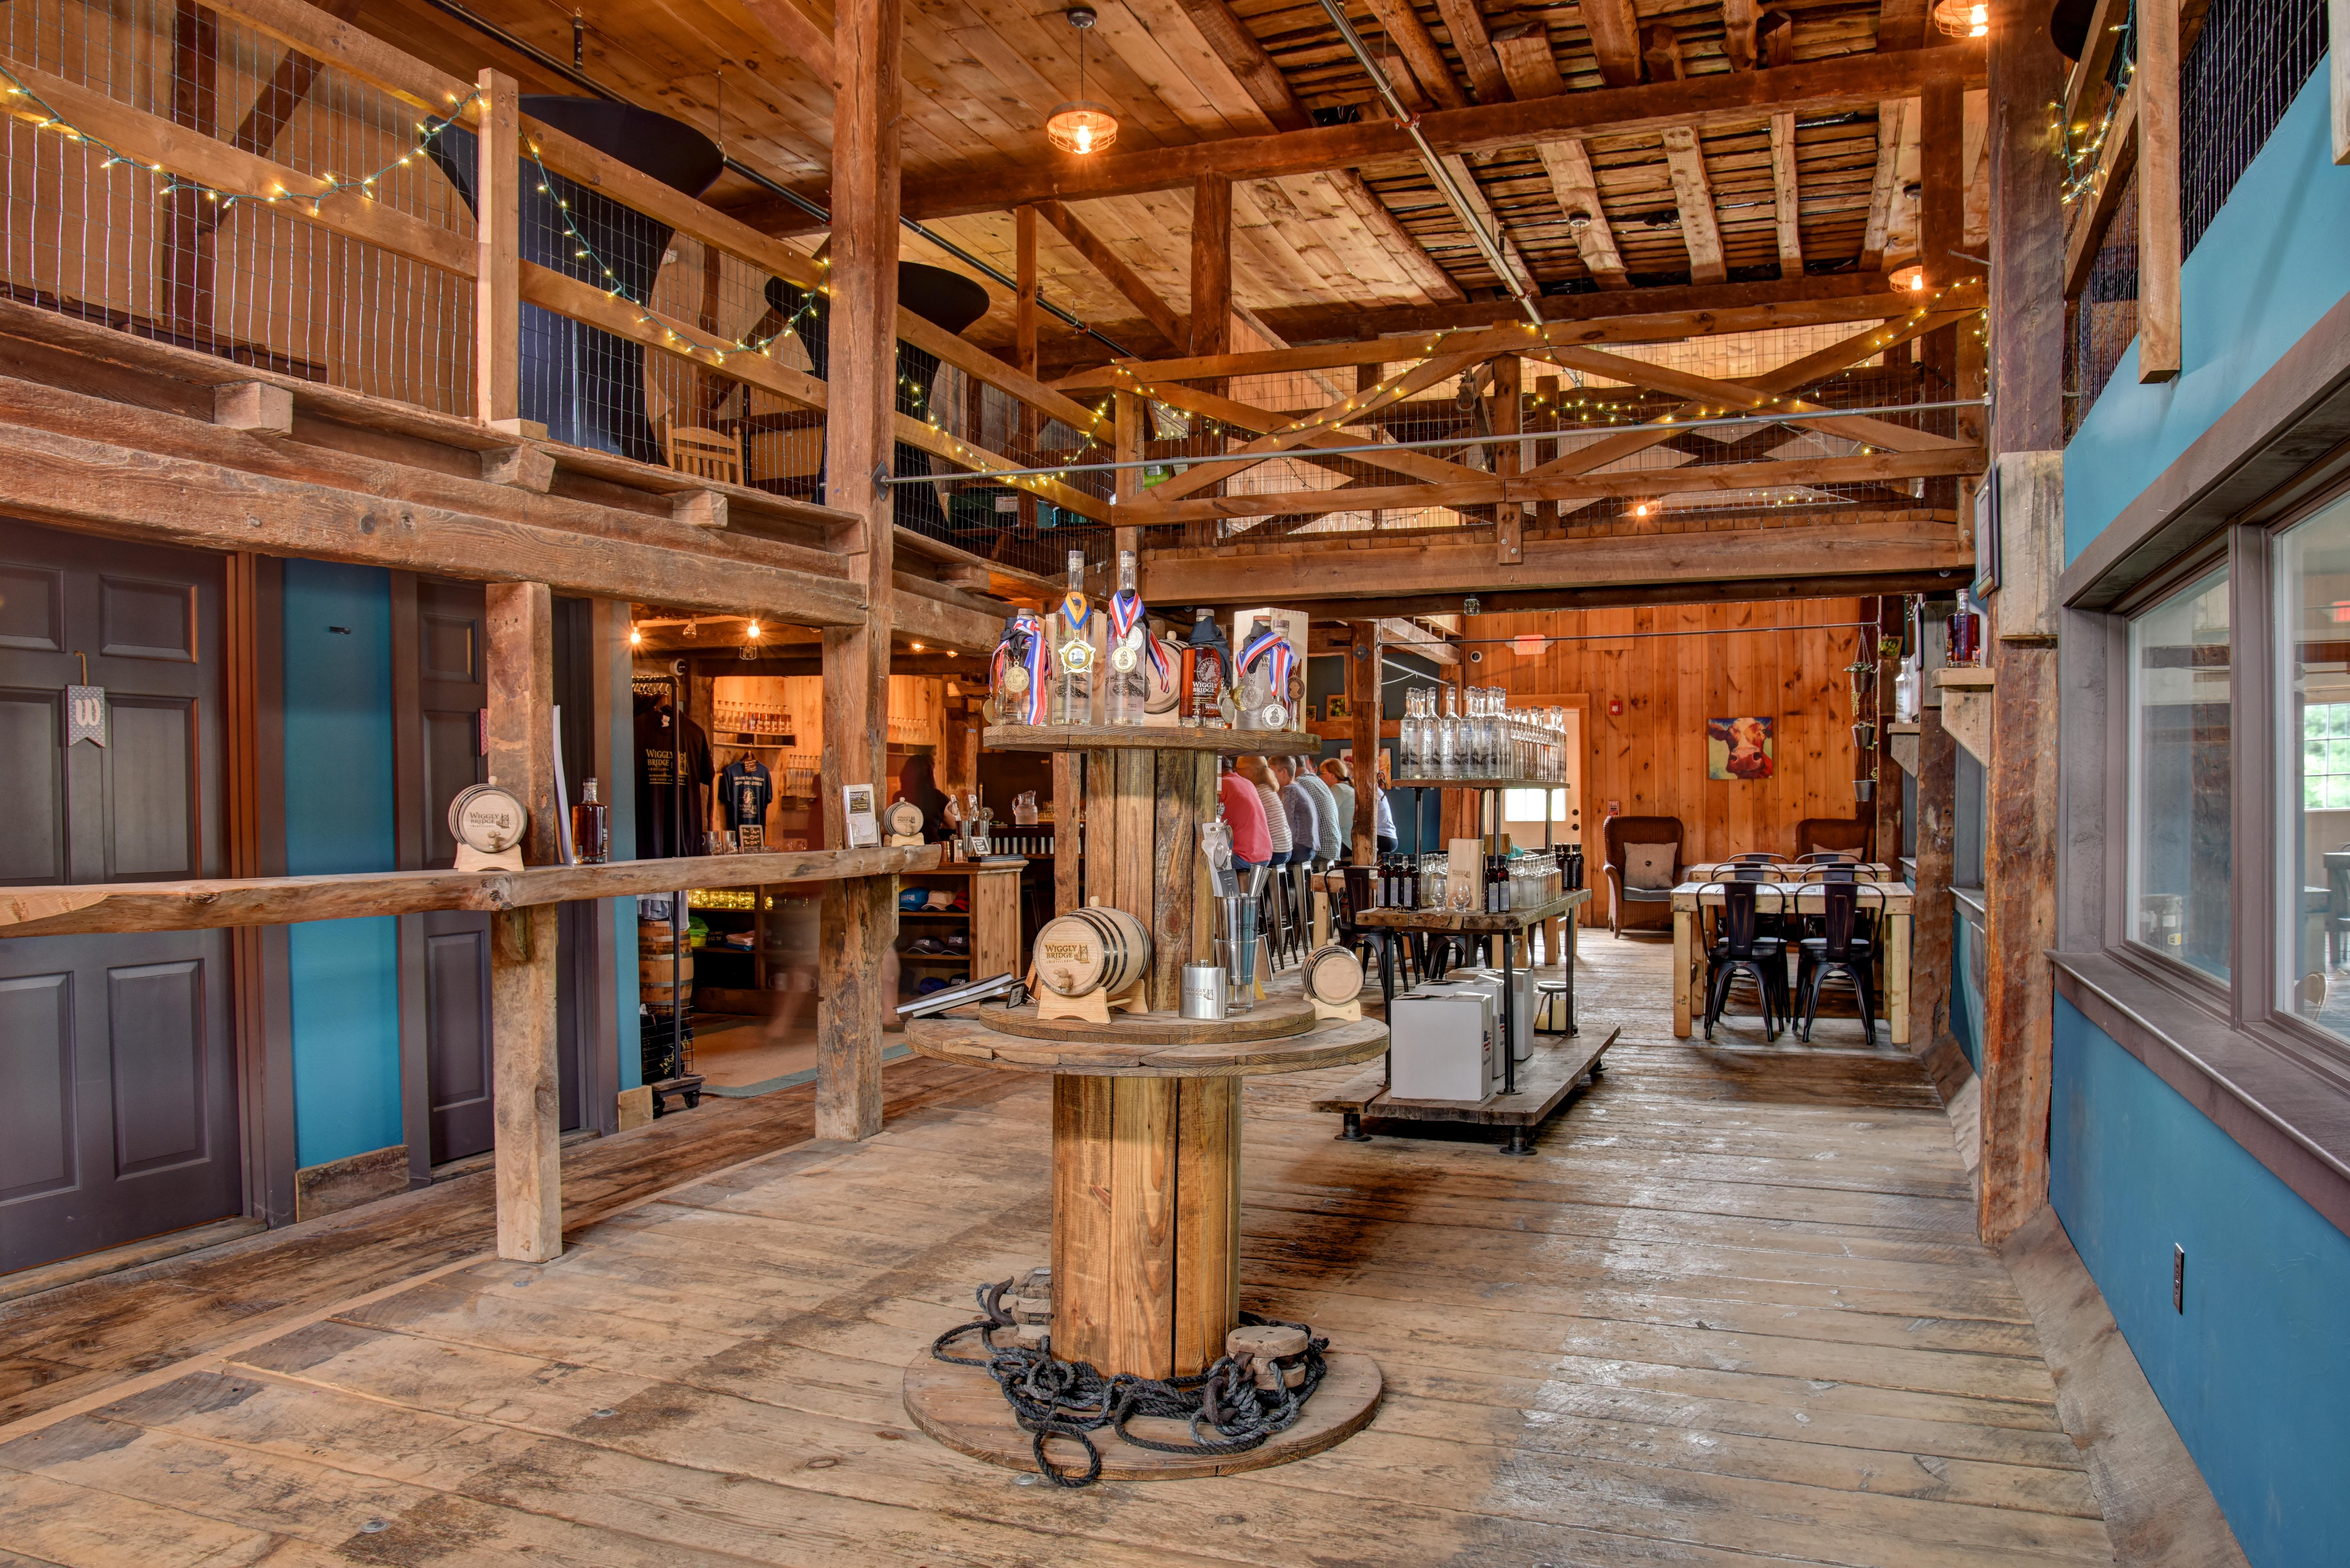 Wiggly Bridge Distillery - York, Maine family run business